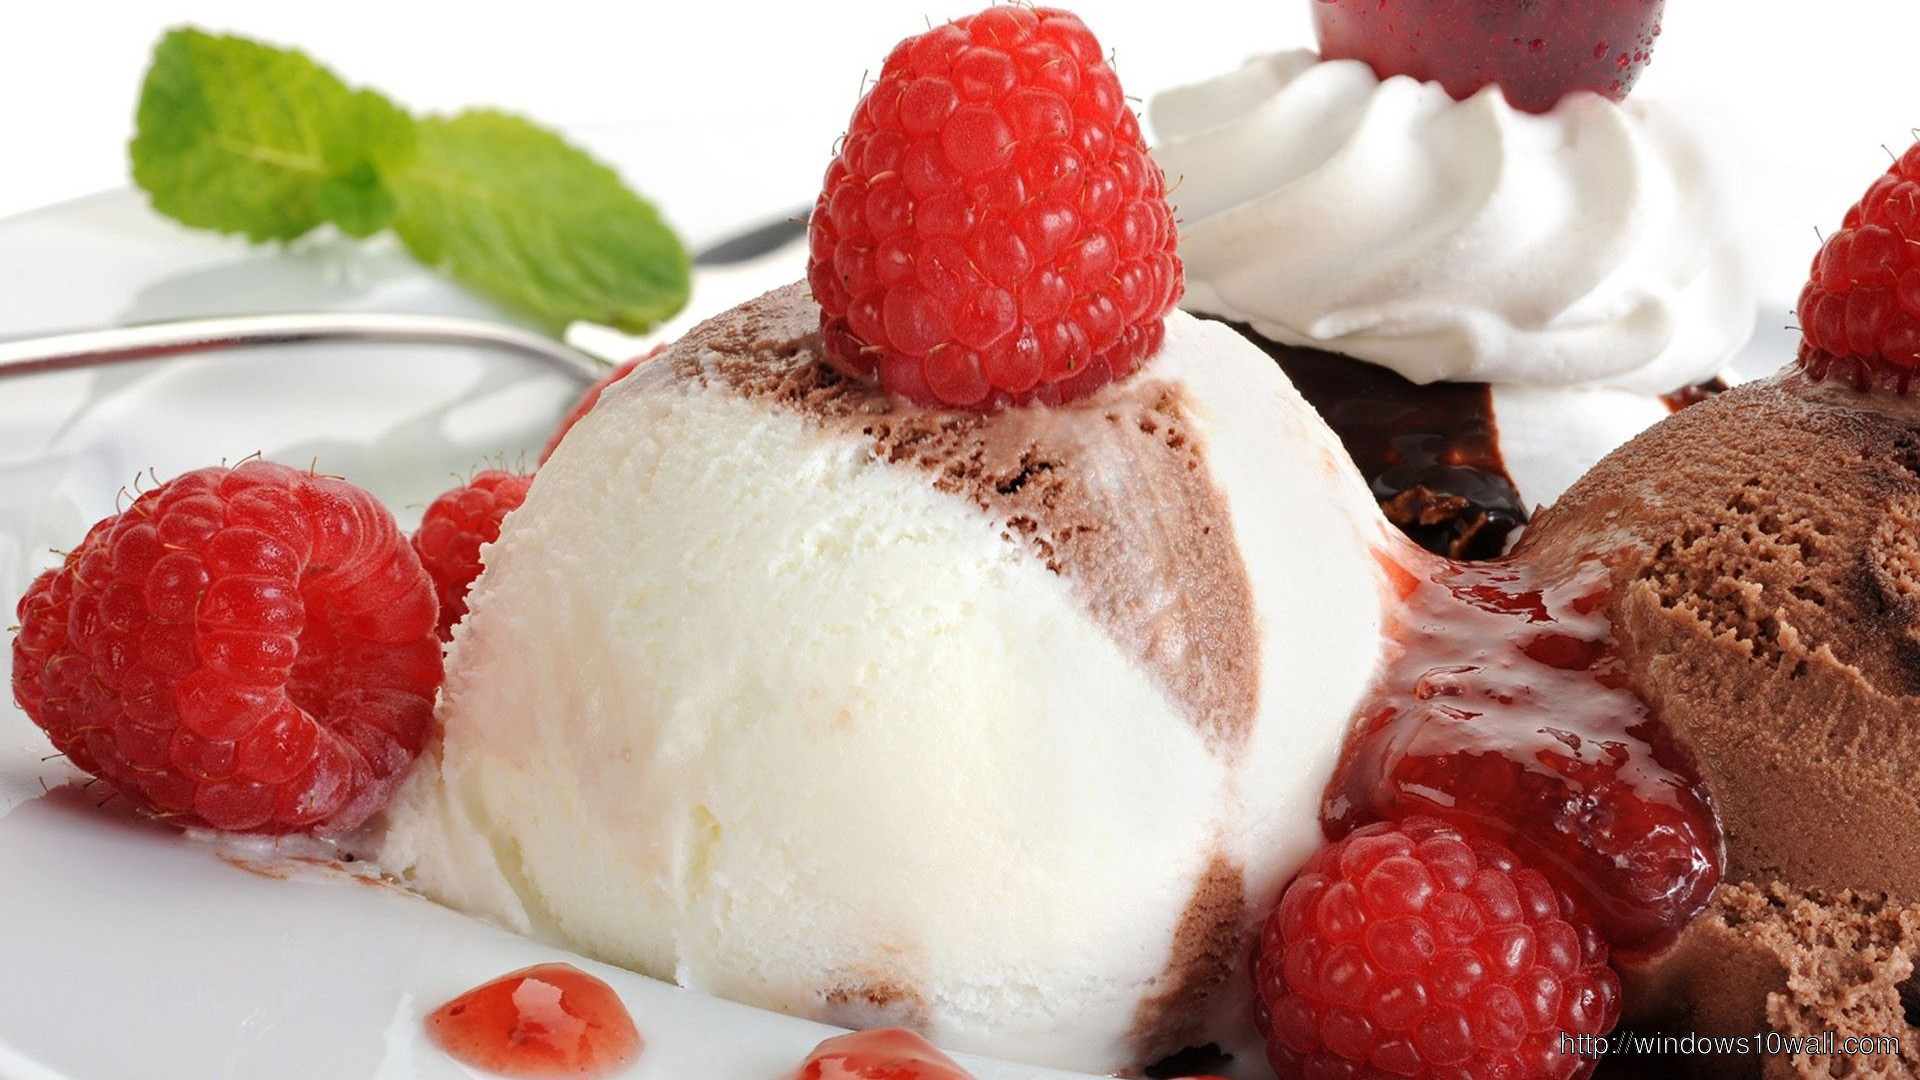 Eminem Wallpaper Iphone 5 Strawberry Chocolate Ice Cream Hd 1080p Wallpaper